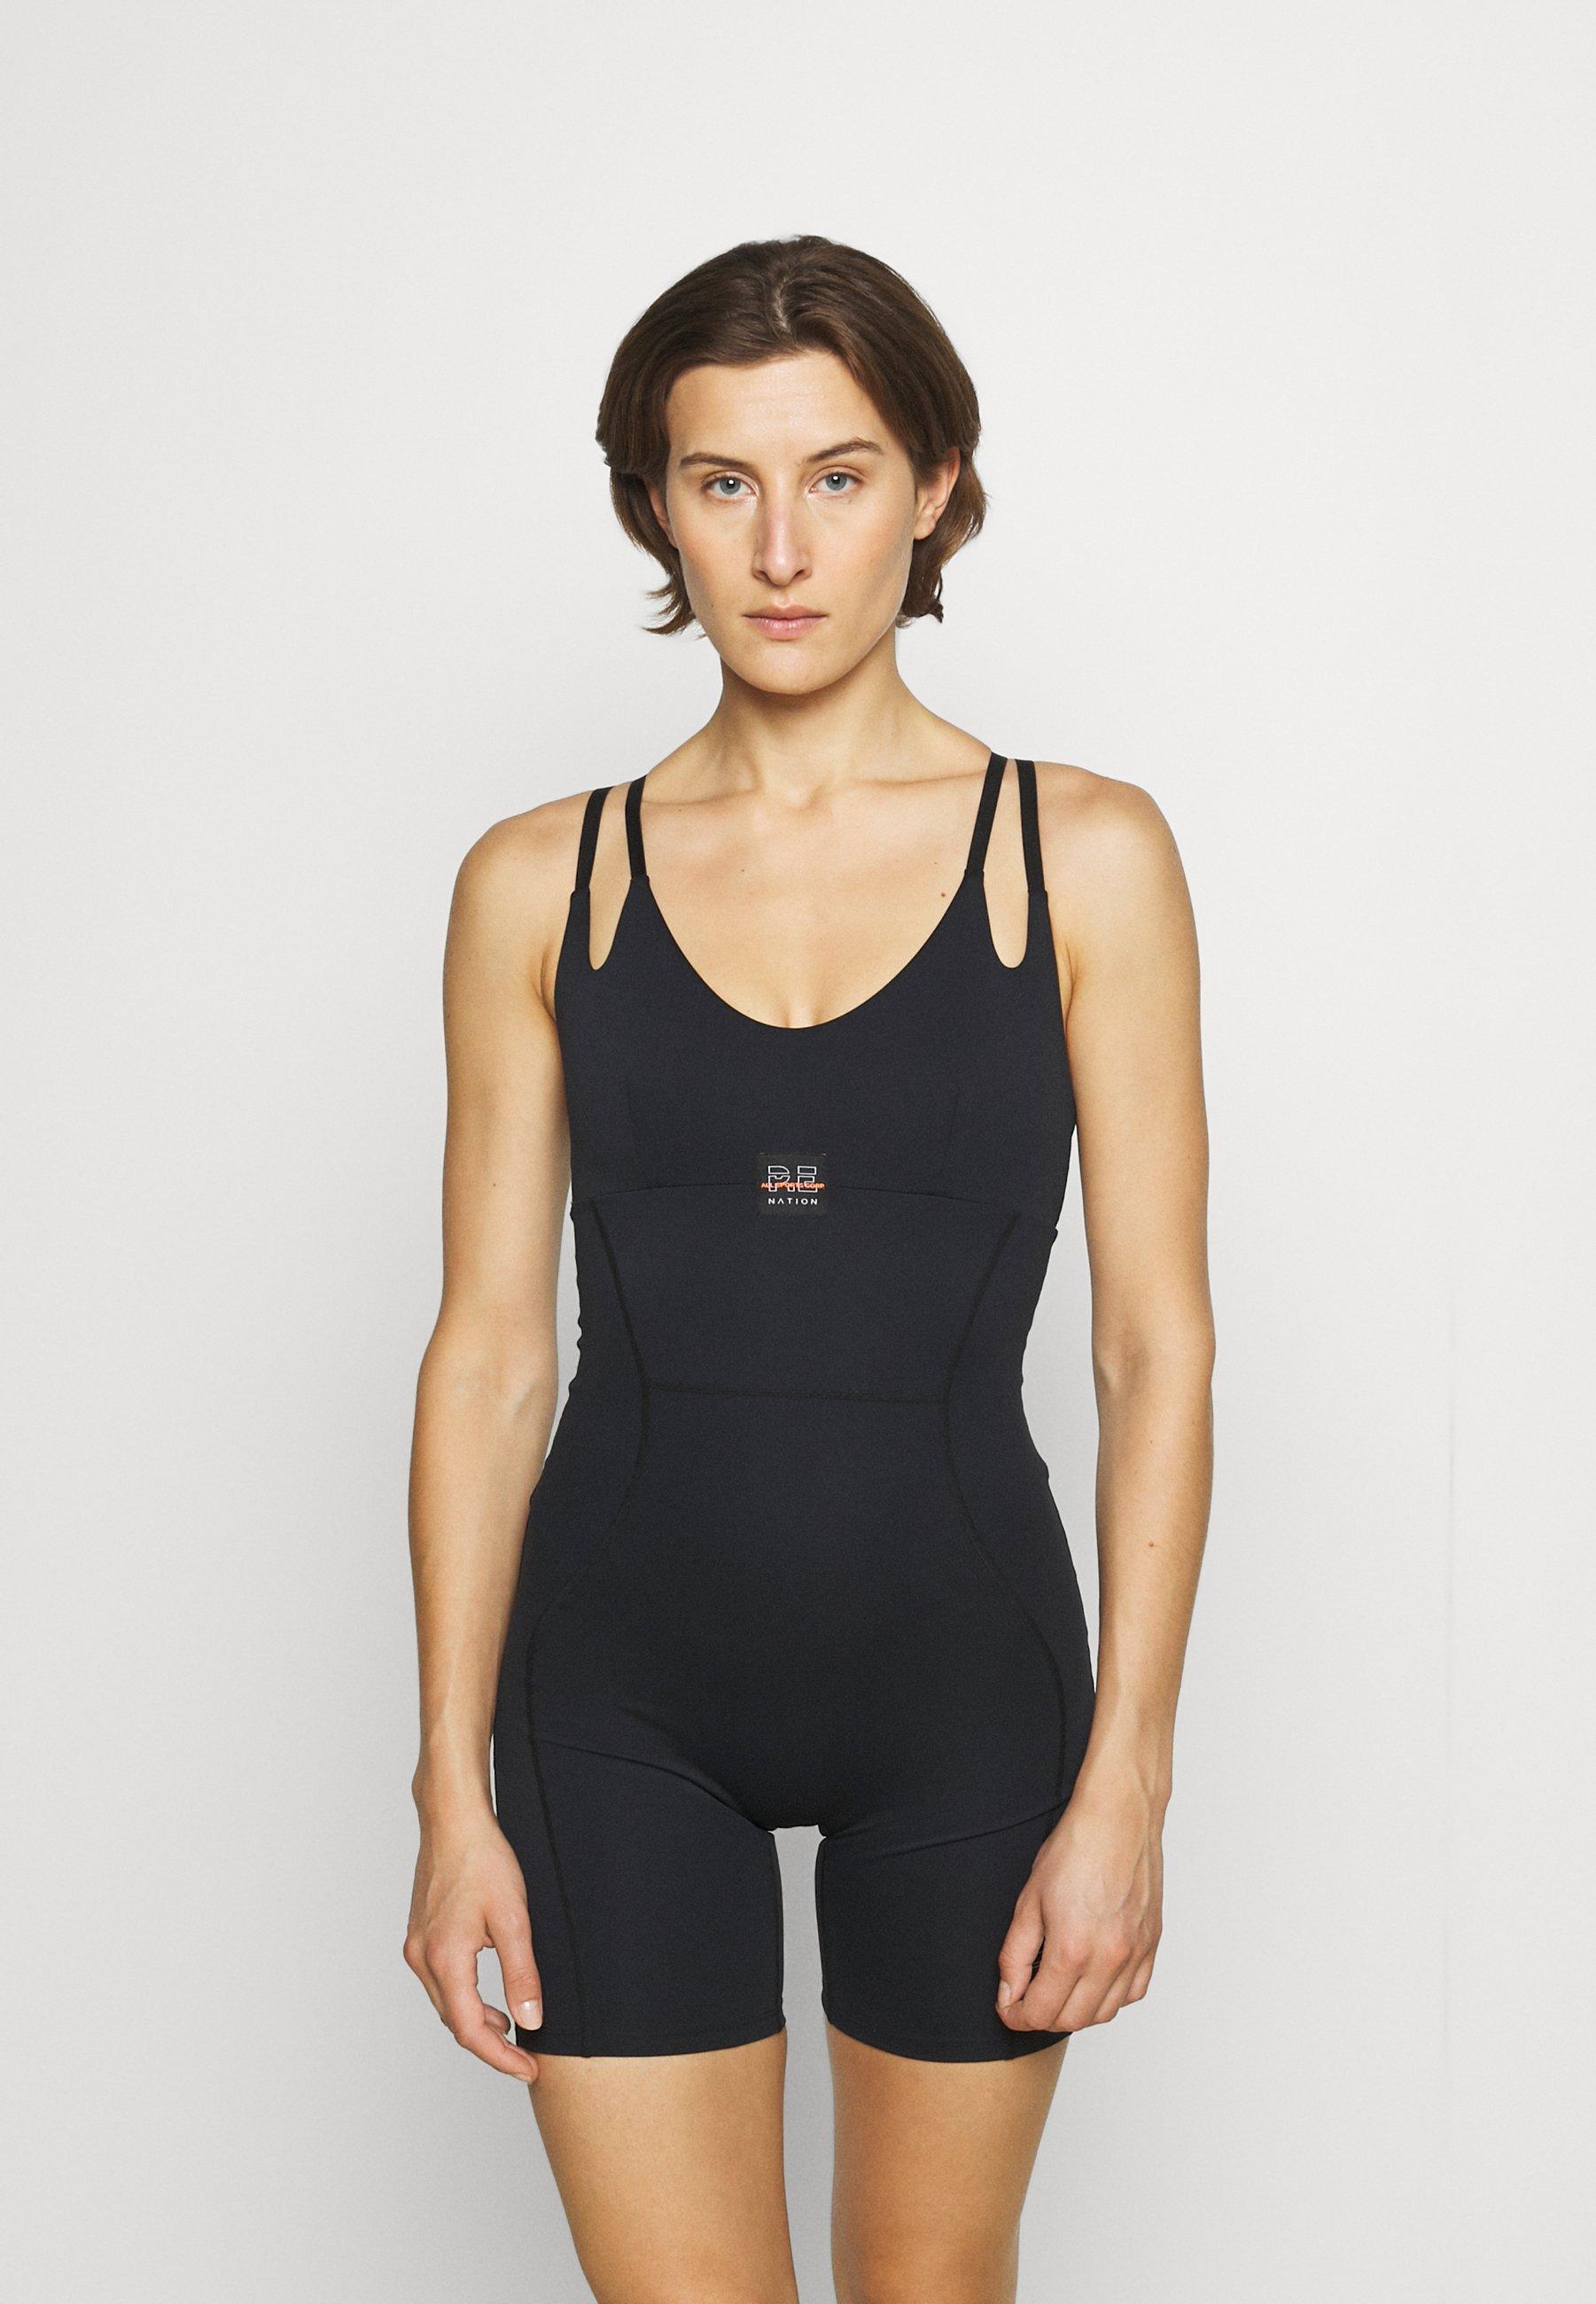 Damen CLOSE OUT ONE PIECE - Trainingsanzug